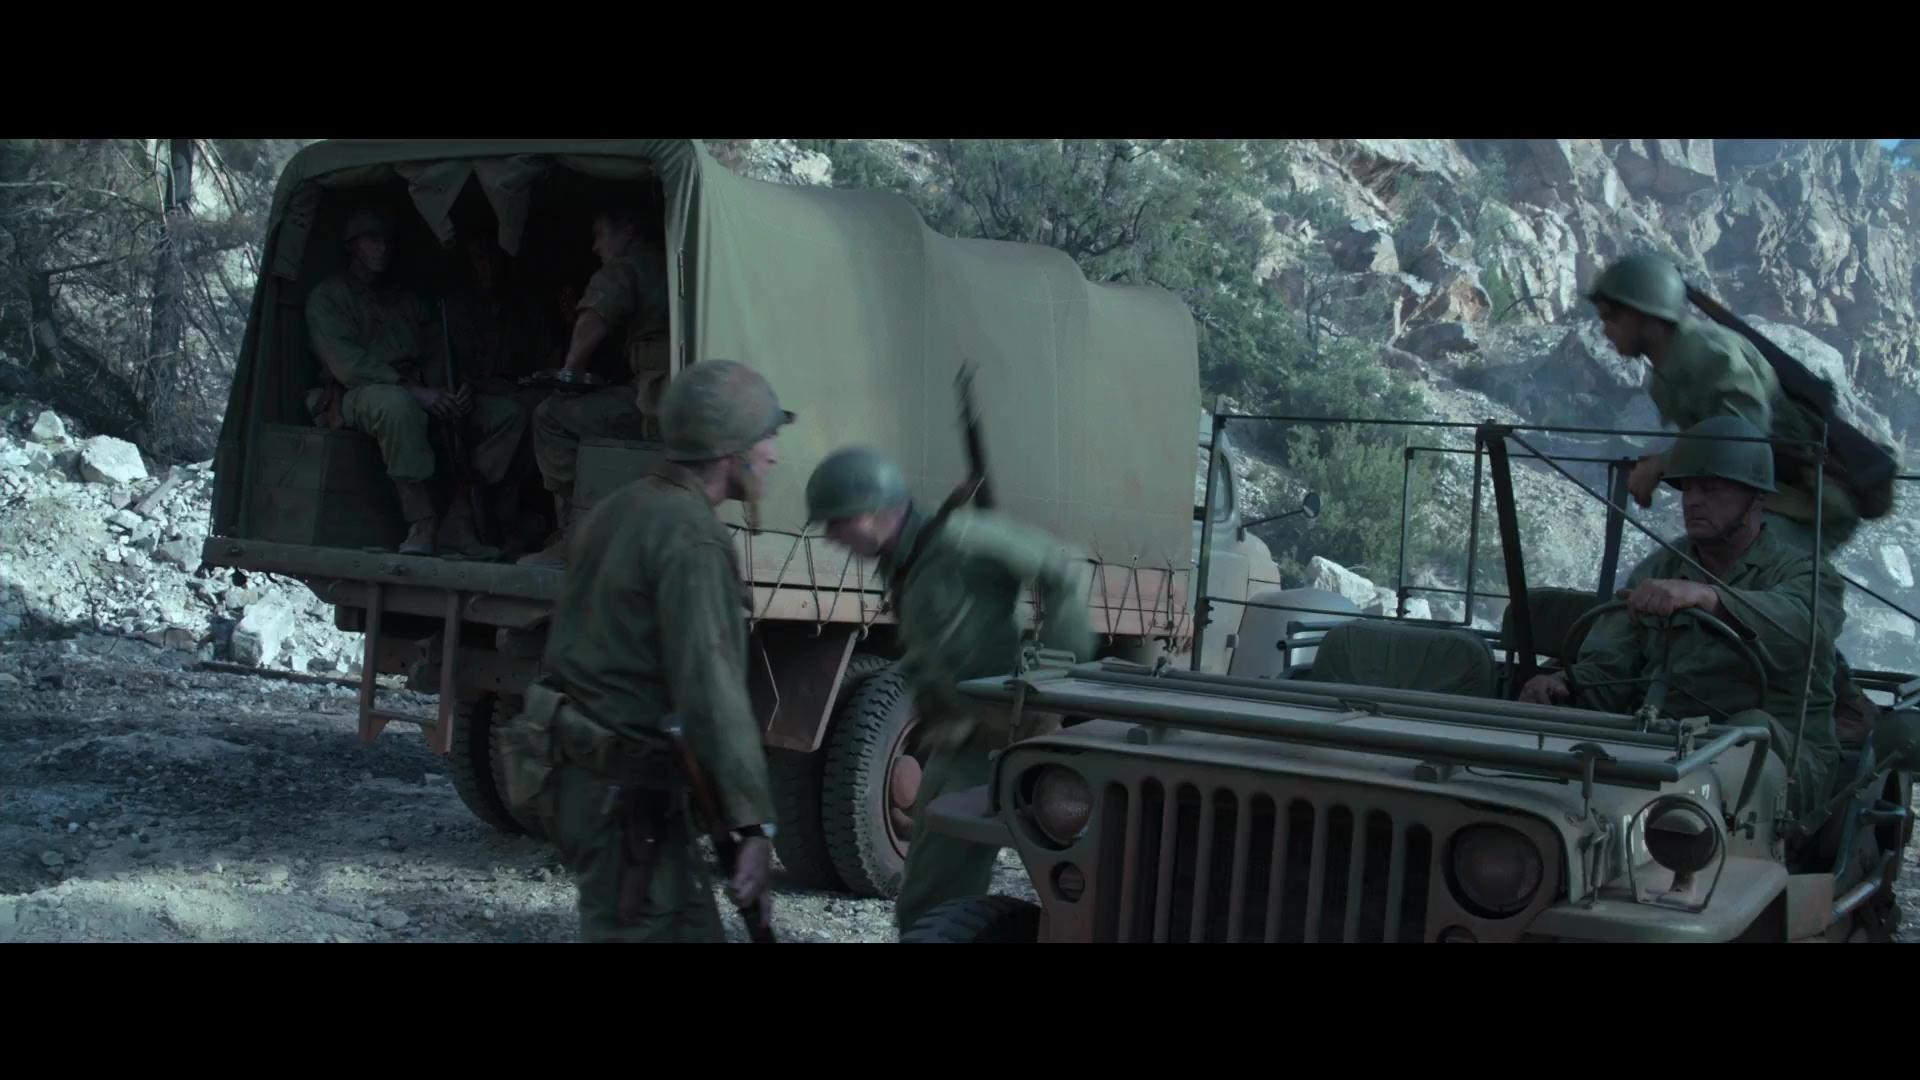 Hasta El Ultimo Hombre 1080p Lat-Cast-Ing 5.1 (2016)